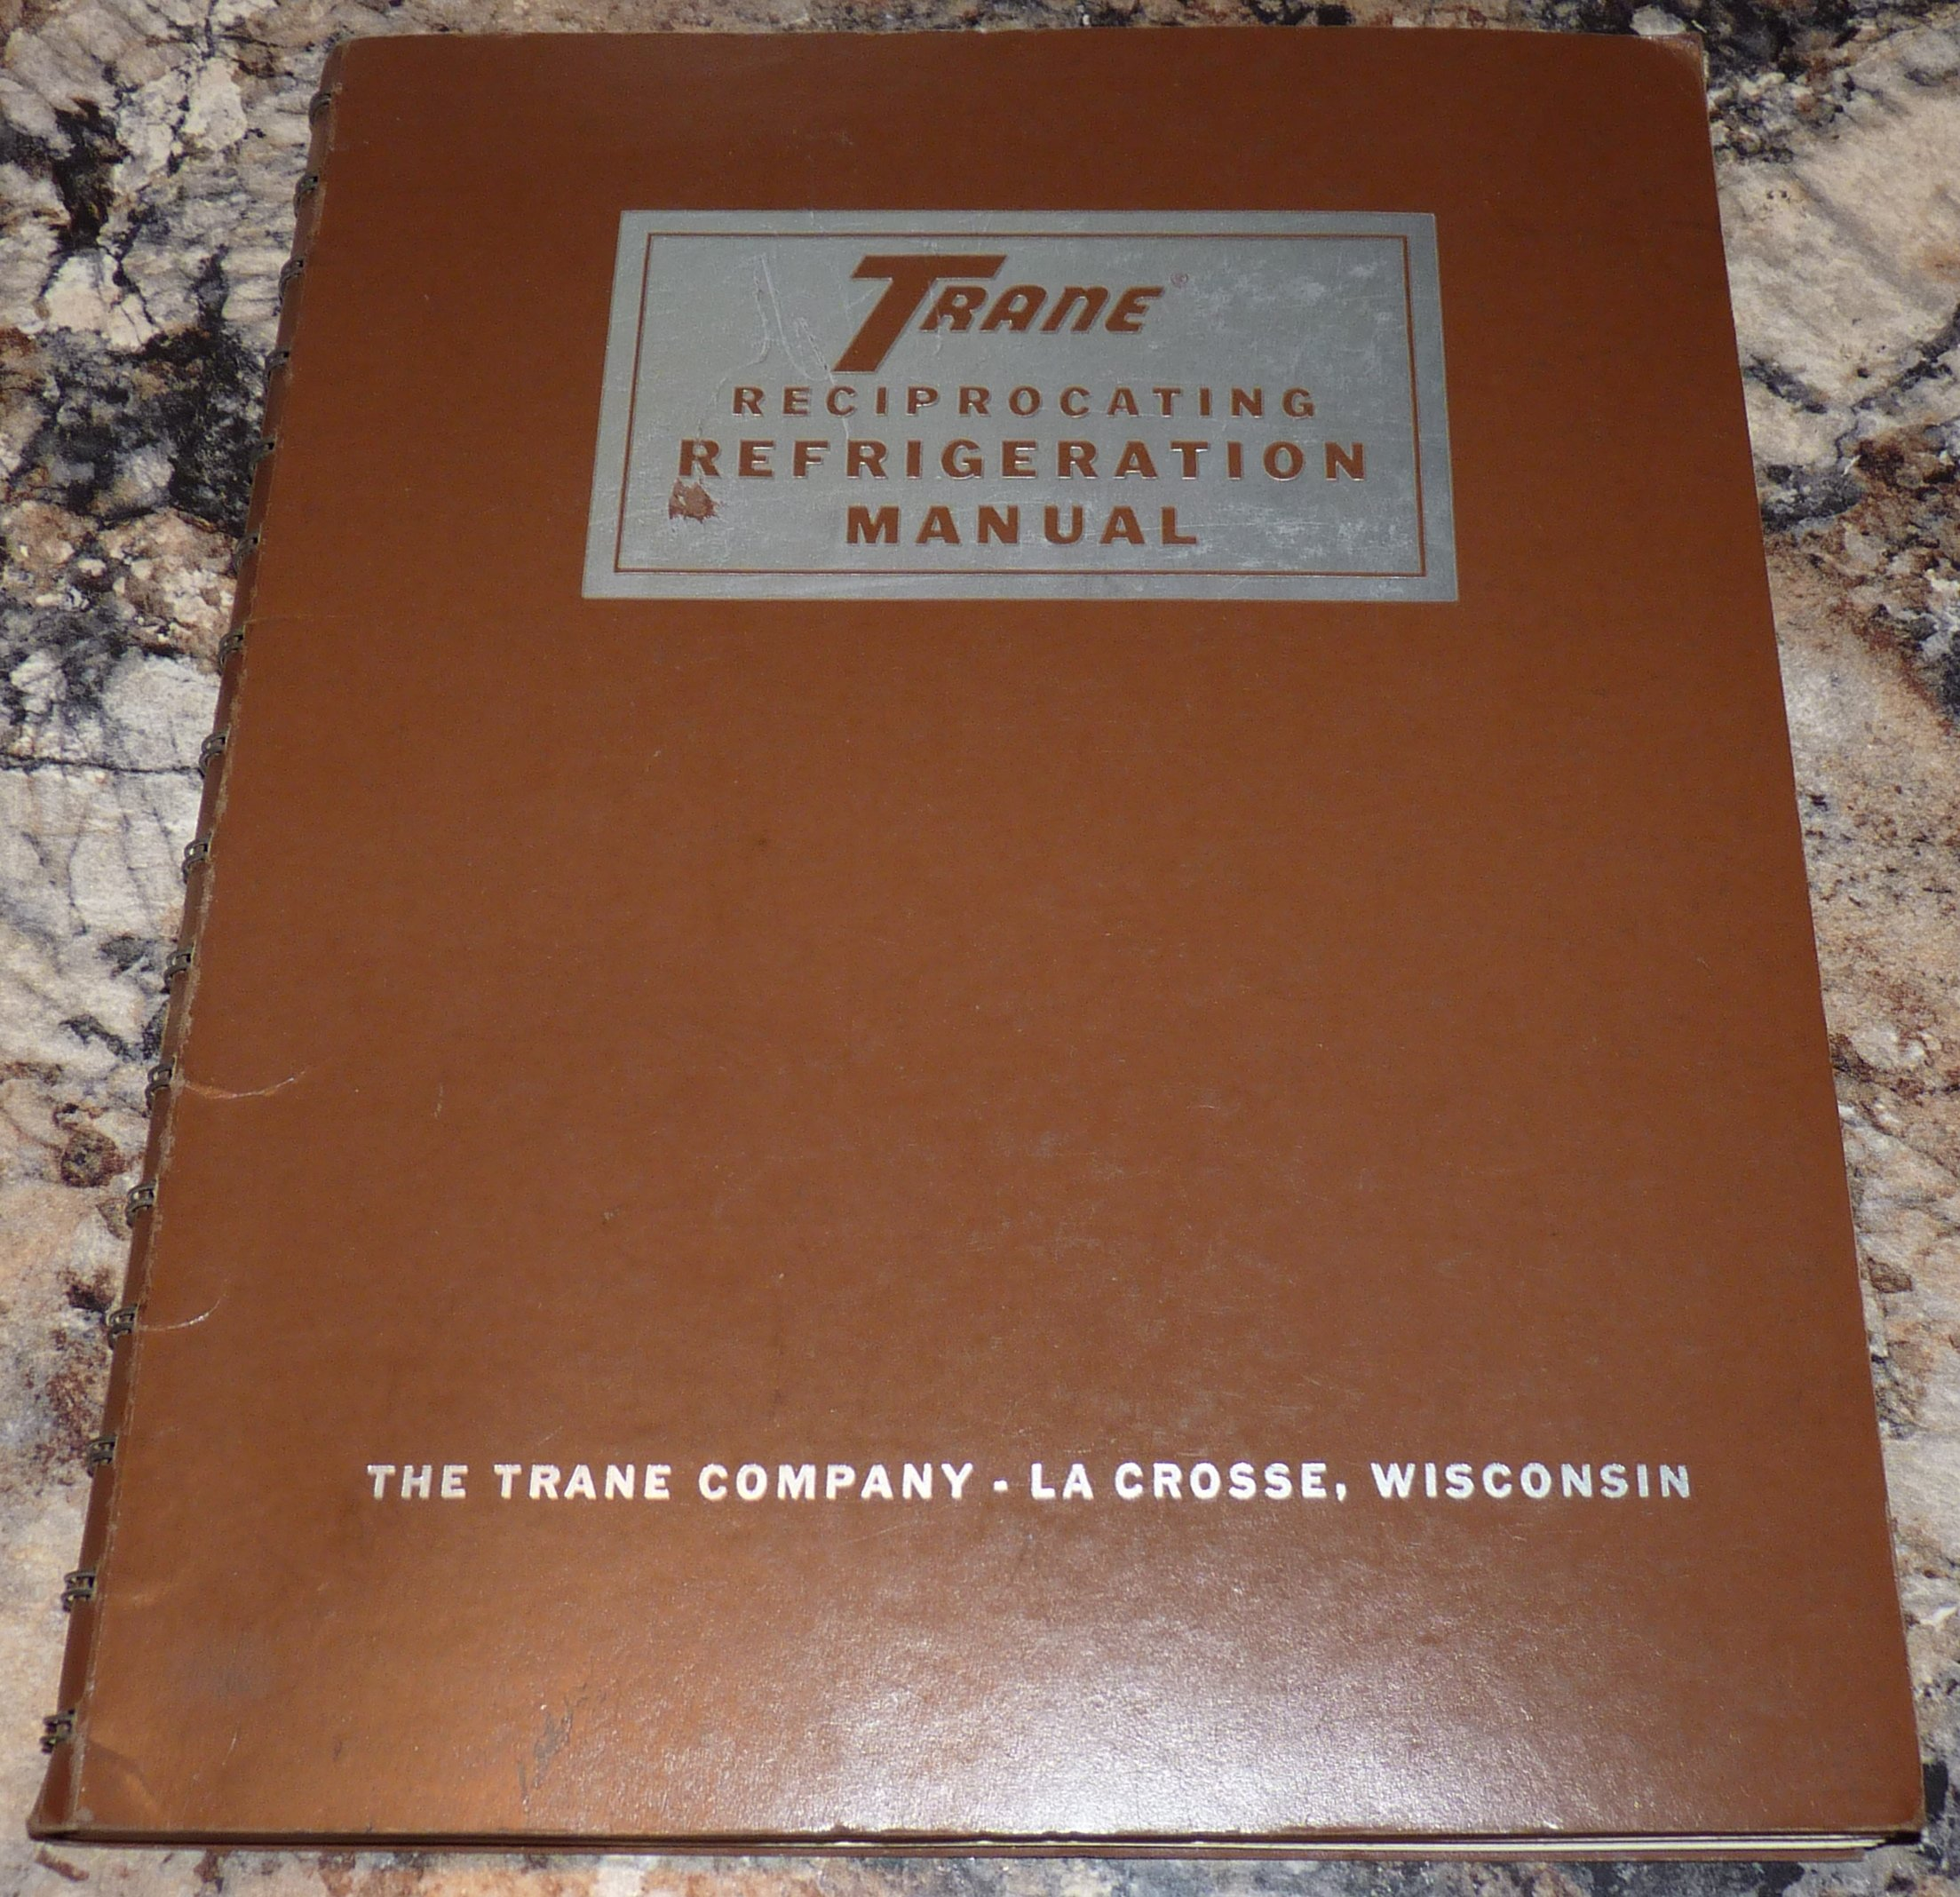 Trane Reciprocating Refrigeration Manual: Trane Company: Amazon.com: Books